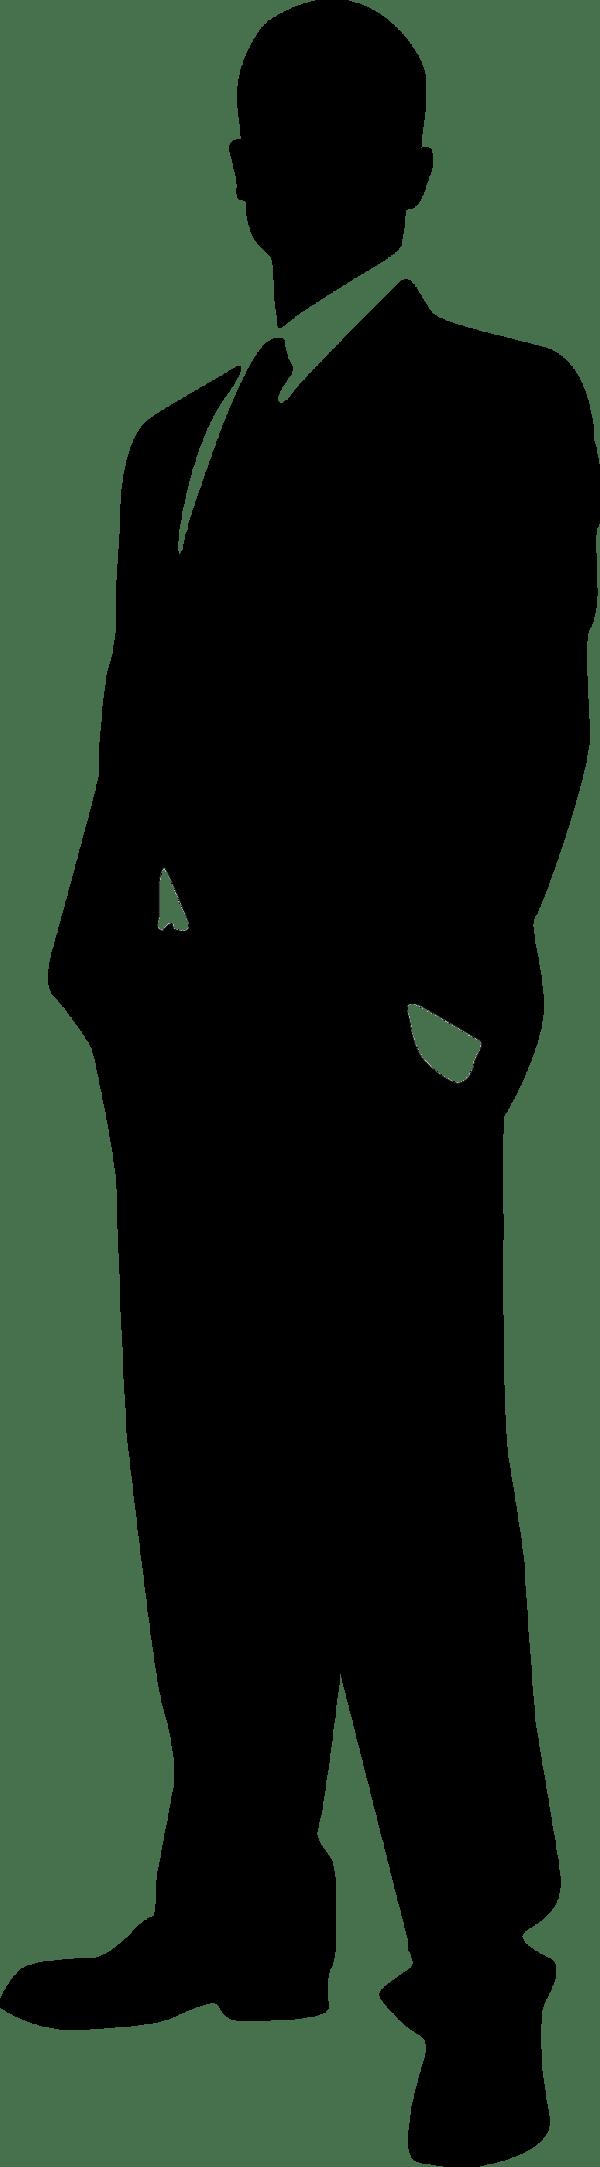 male silhouette clipart - clipground